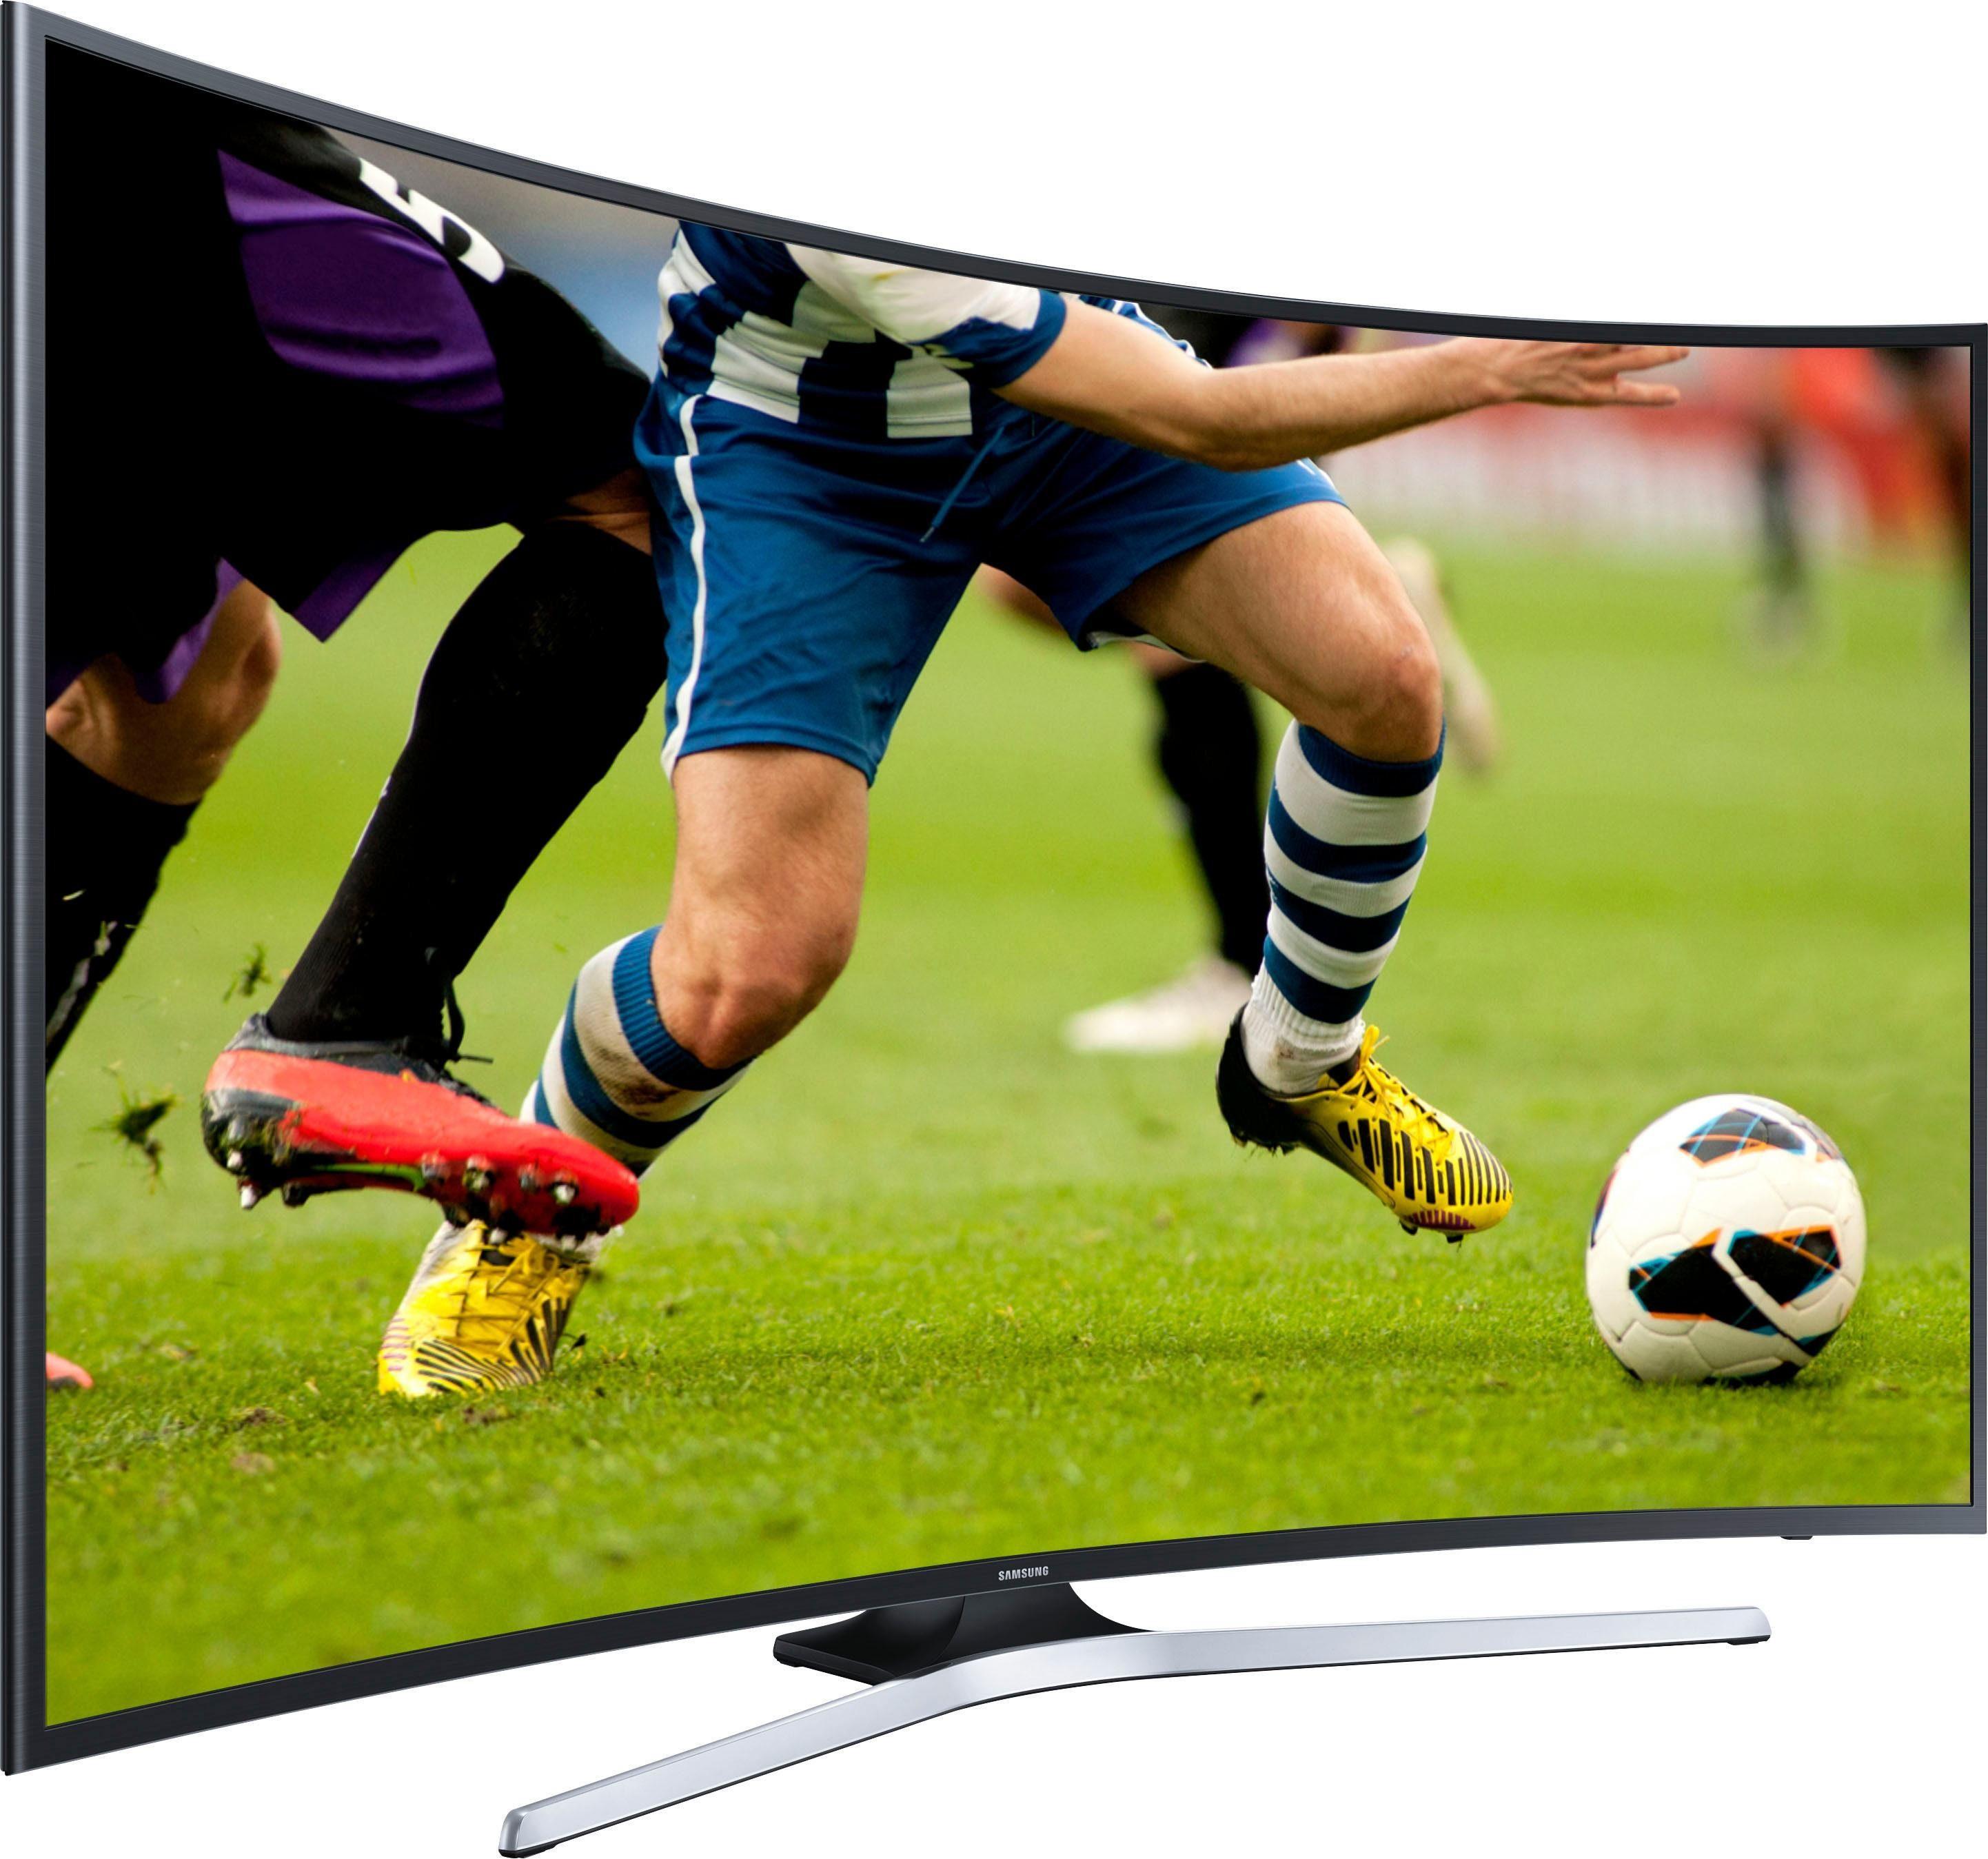 Samsung UE55MU6279 Curved-LED-Fernseher (55 Zoll, 4K Ultra HD, Smart-TV)